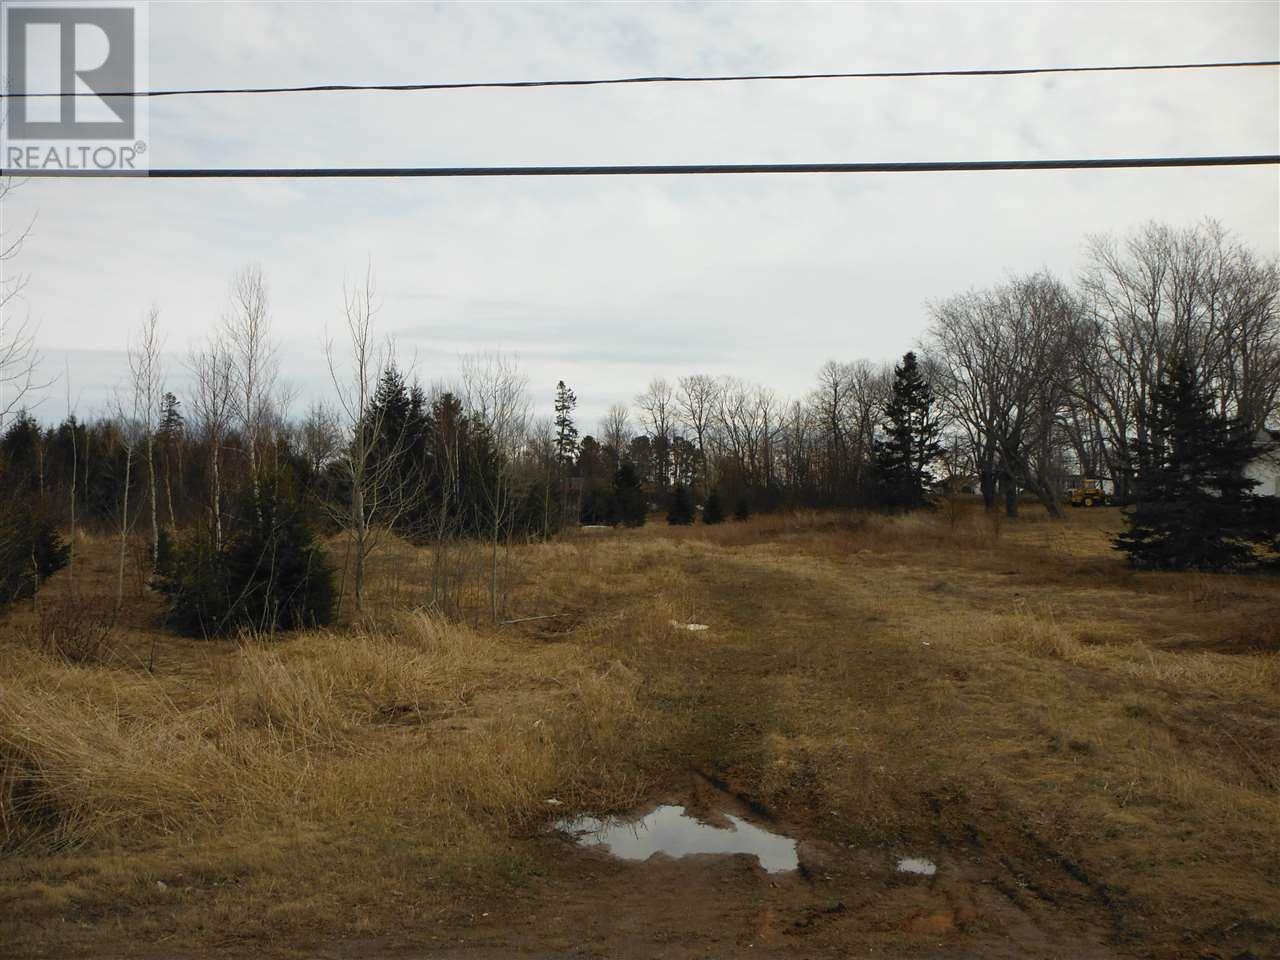 Lot 1-16 Royalty Junction Road, Charlottetown, Prince Edward Island  C1E 1Z2 - Photo 6 - 202006111